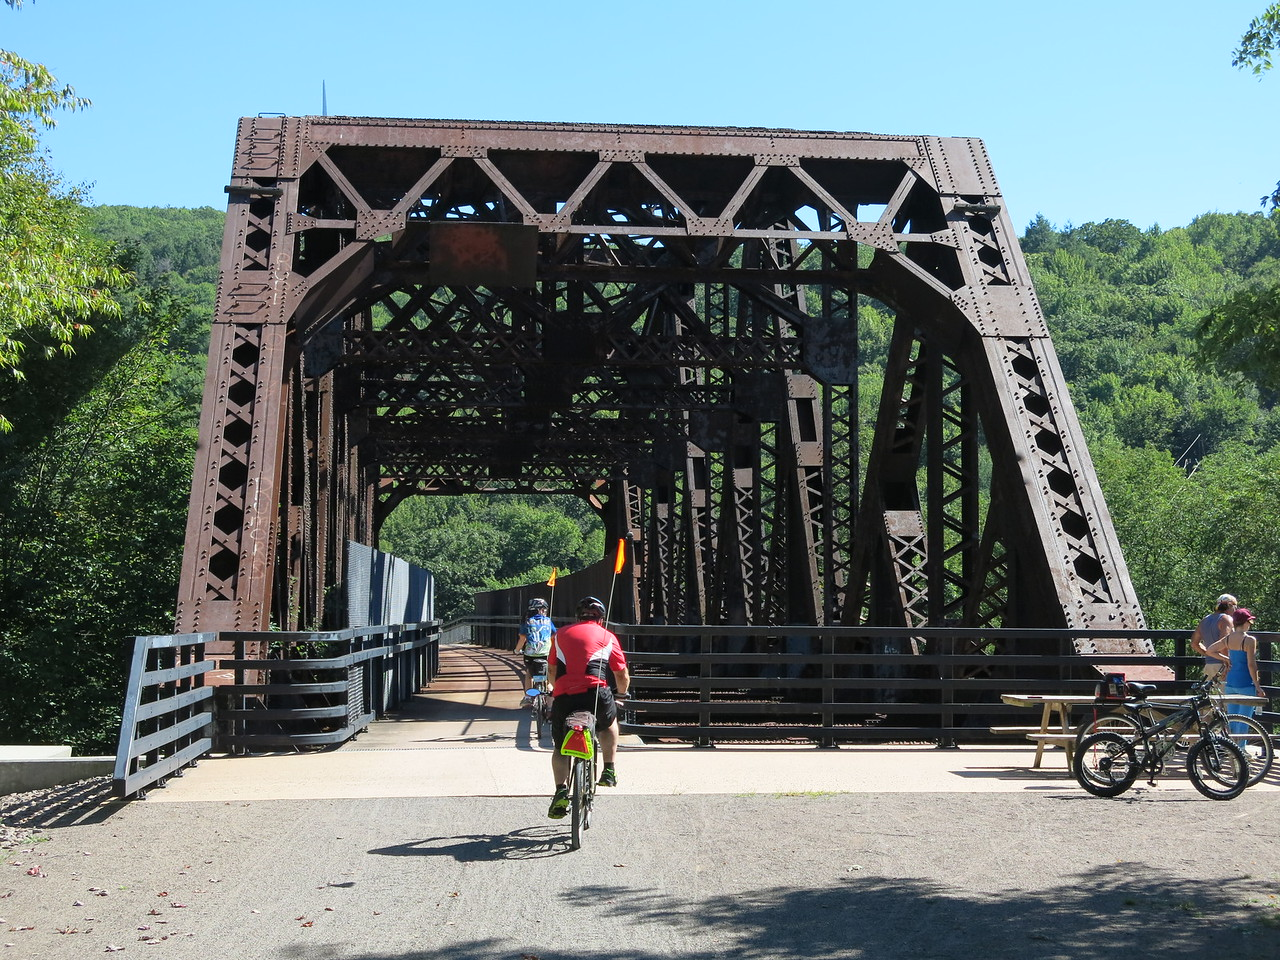 Keystone Viaduct at MP 30